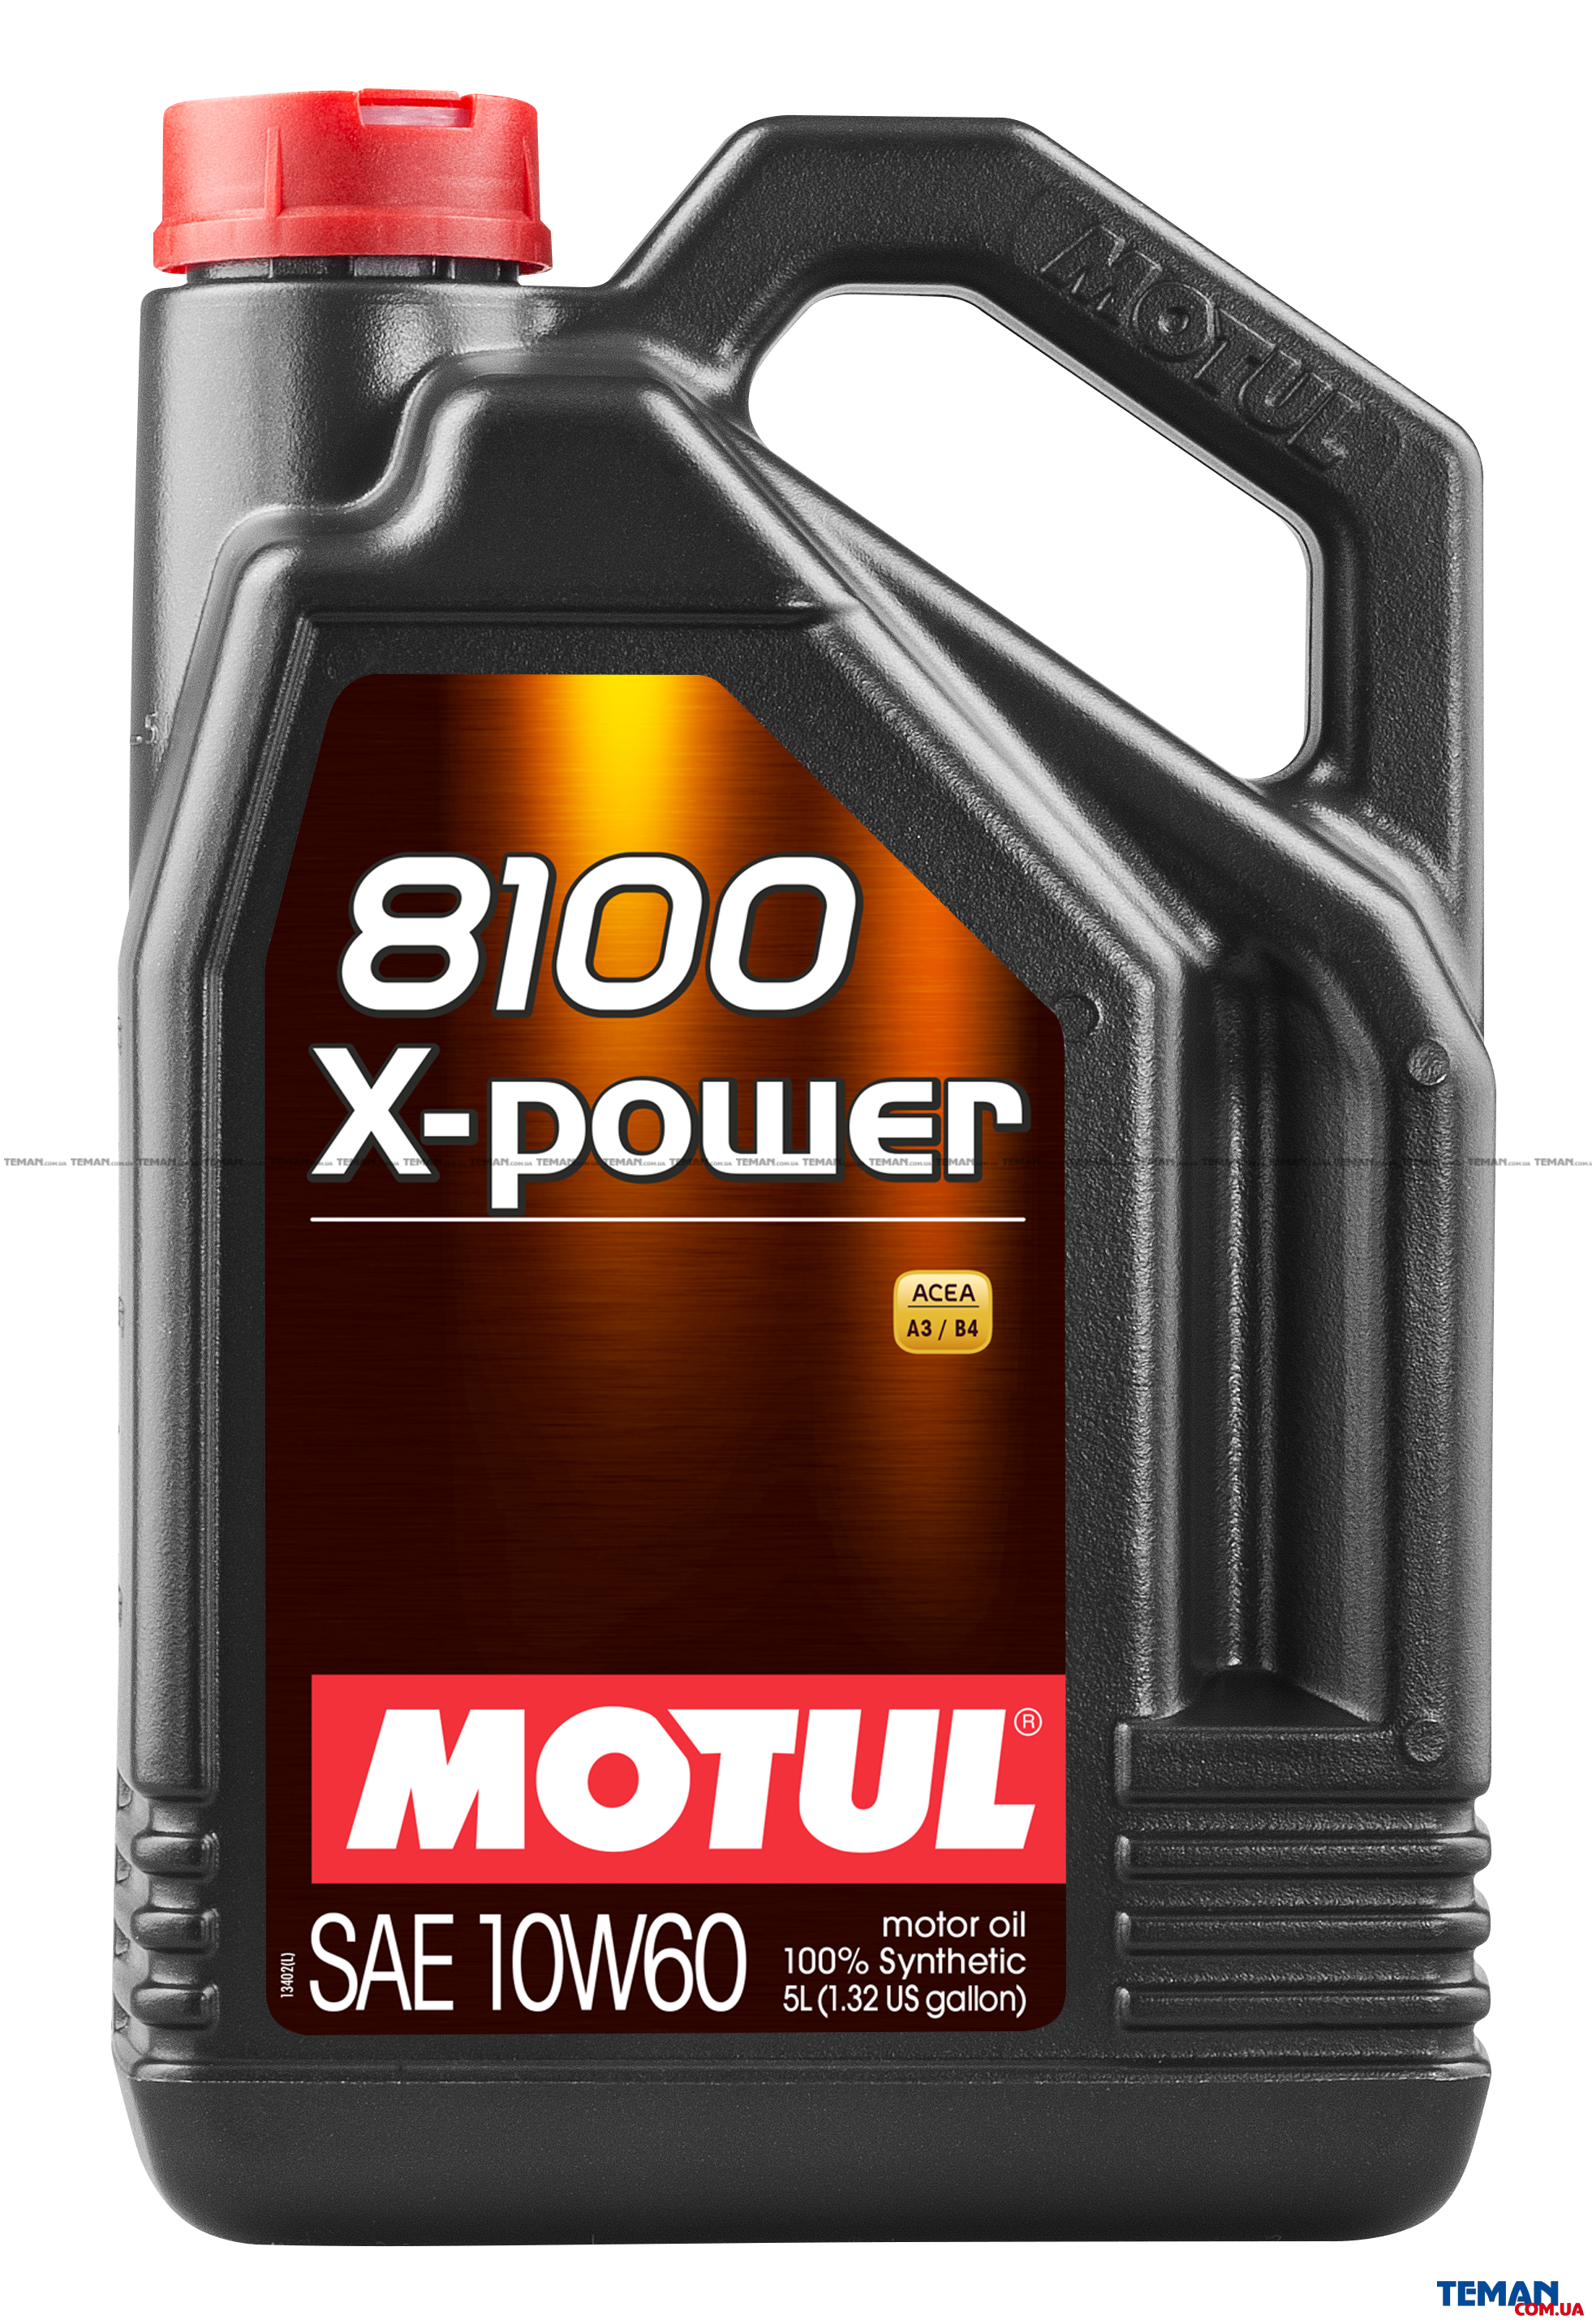 Синтетическое моторное масло 8100 X-power SAE 10W60, 5 л